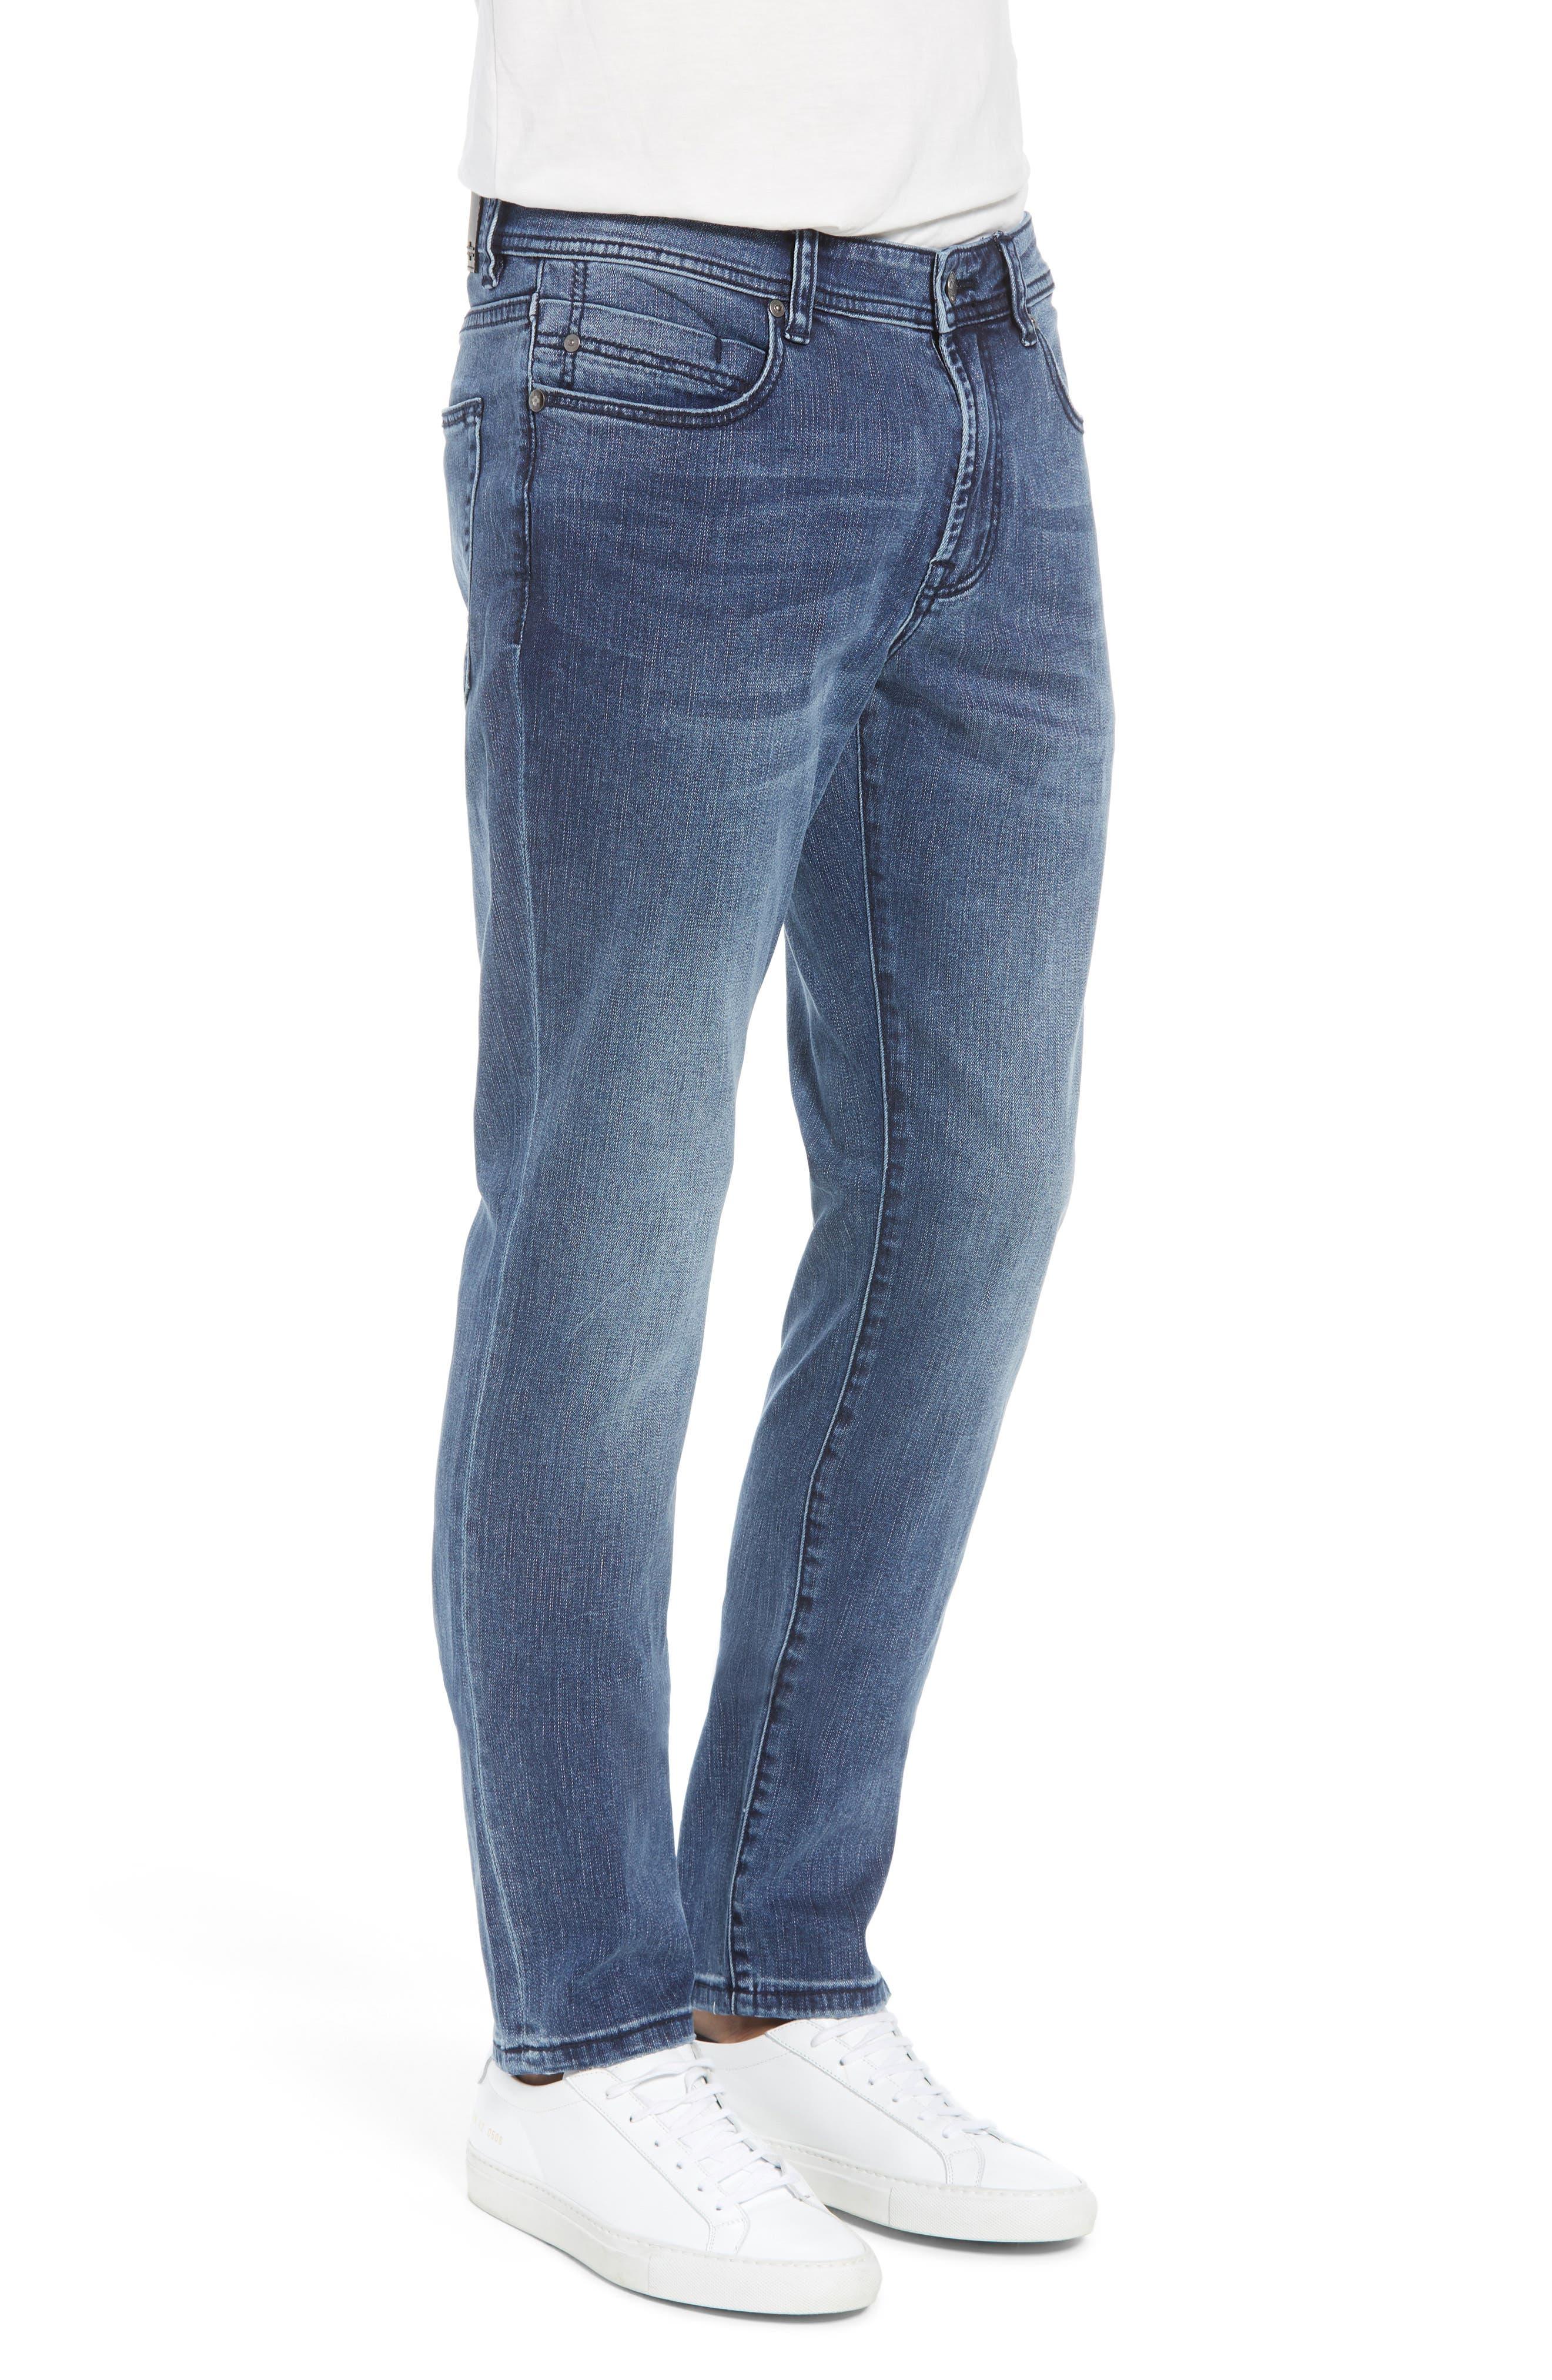 Jeans Co. Slim Straight Leg Jeans,                             Alternate thumbnail 3, color,                             Southaven Mid Blue